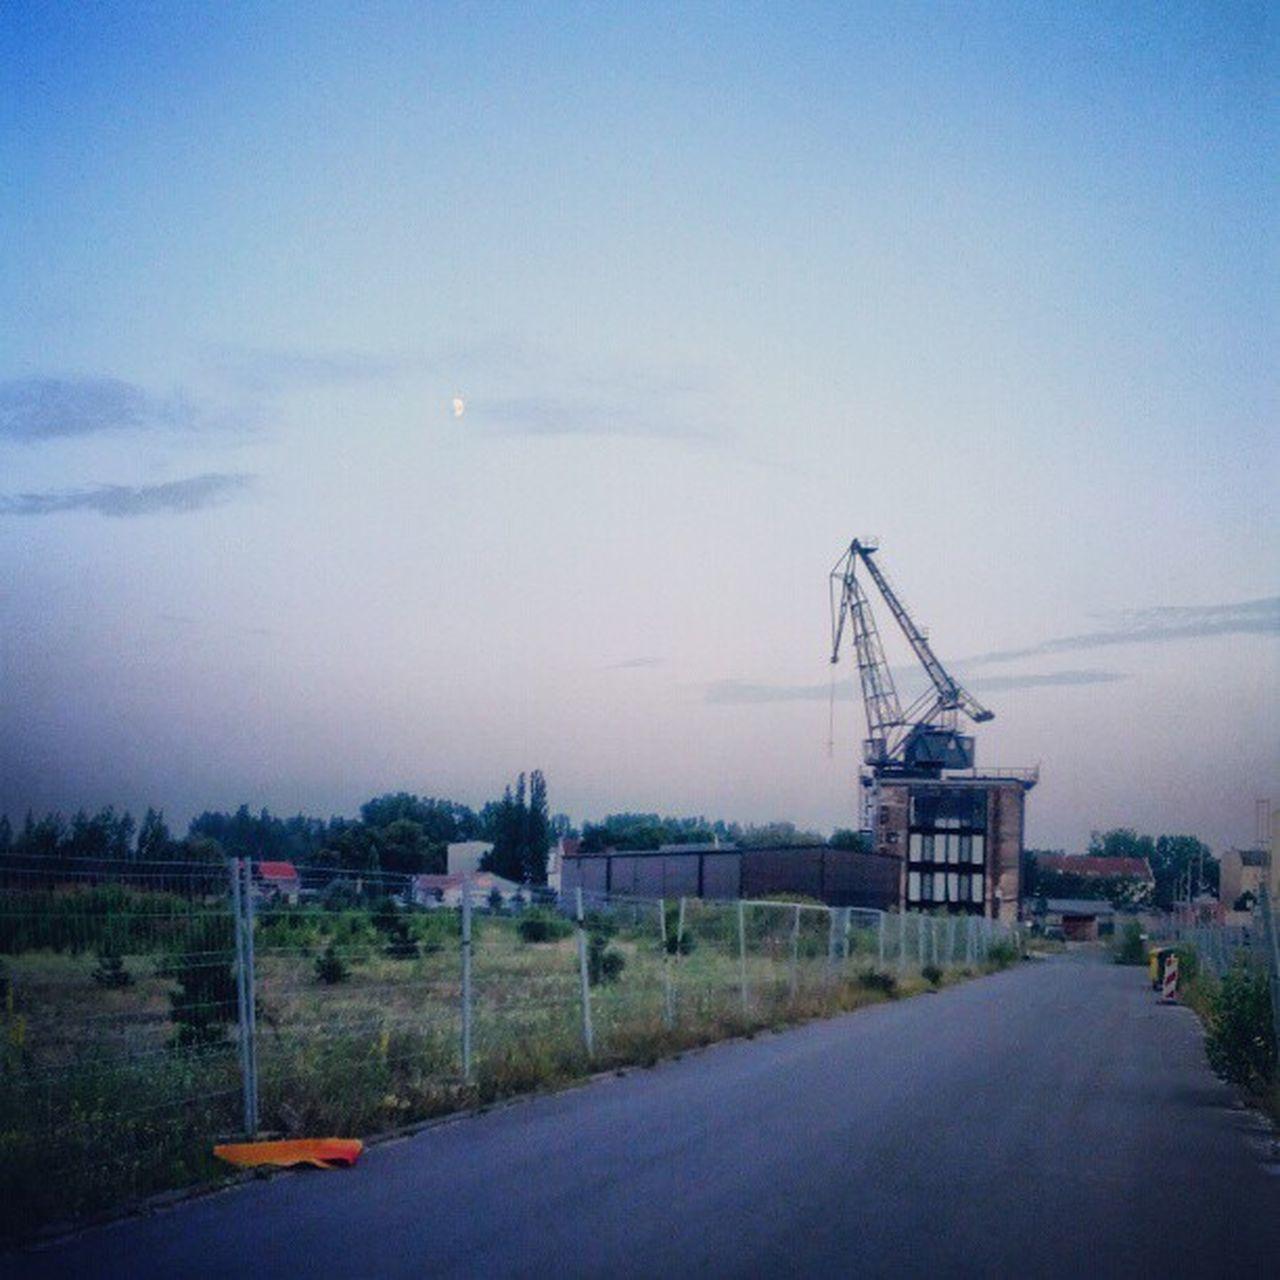 I want to join #team_craneaddicted - kann ich mitspielen maitre_b? #crane #moon #skyporn Crane Skyporn Team_craneaddicted Moon